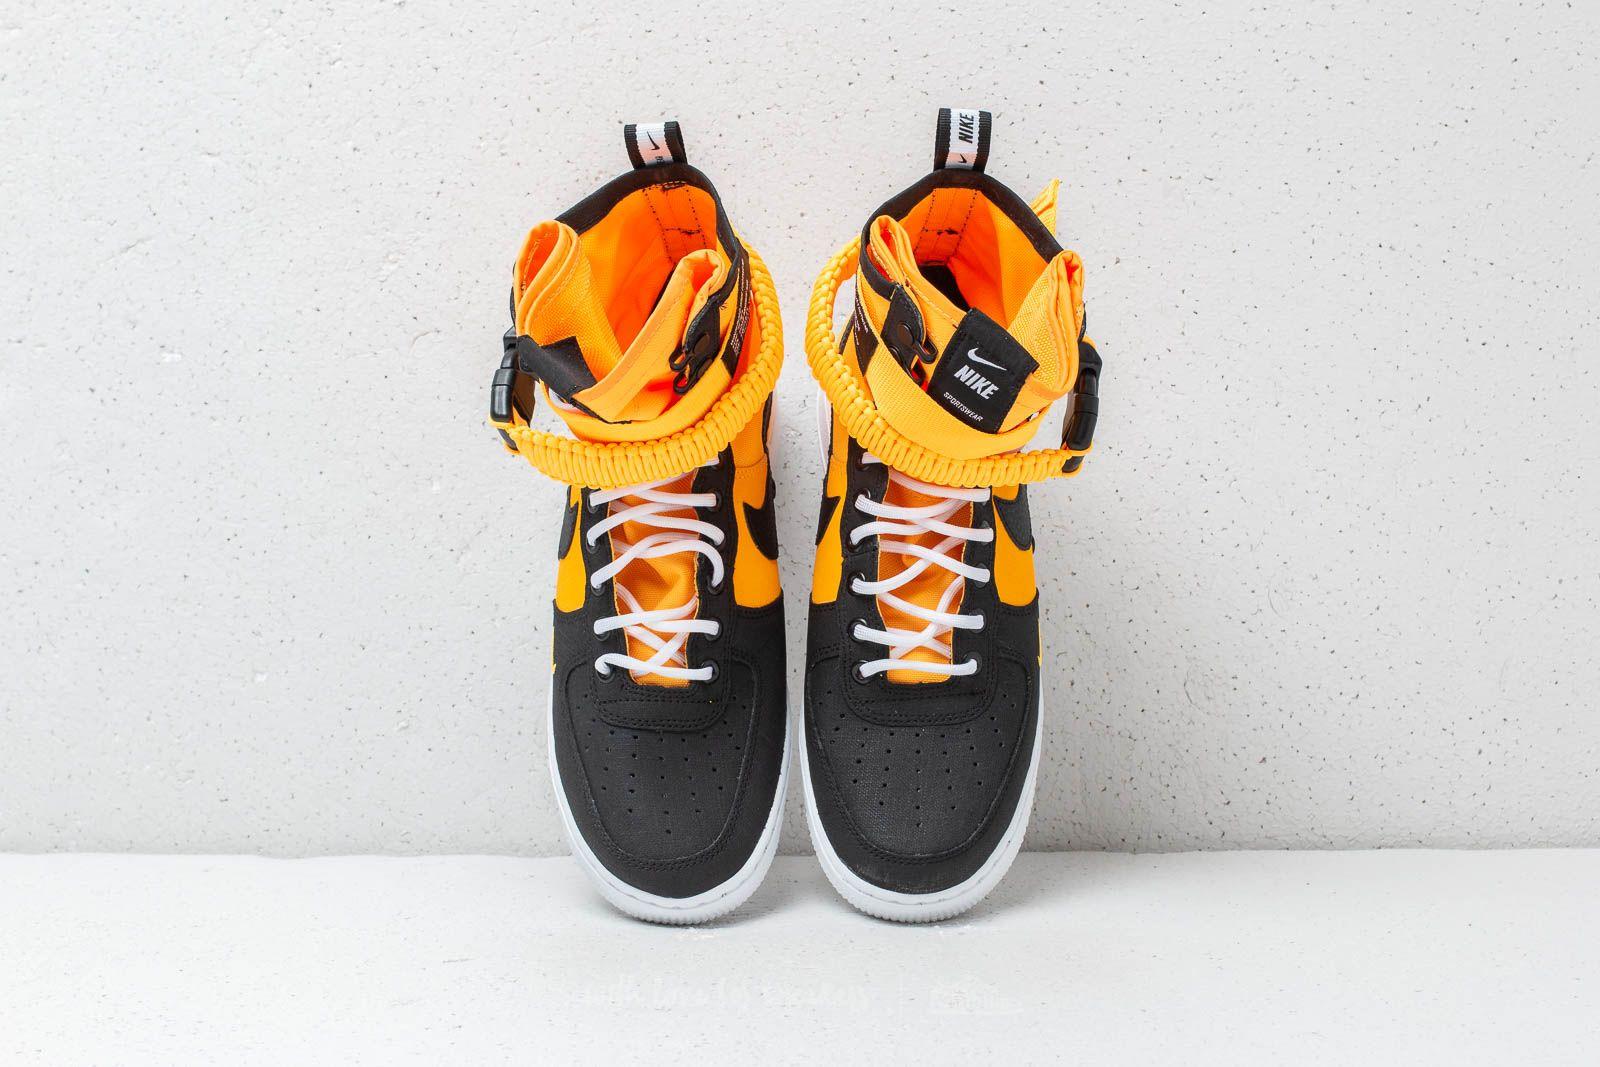 Nike SF Air Force 1 Laser Orange Black White | Footshop